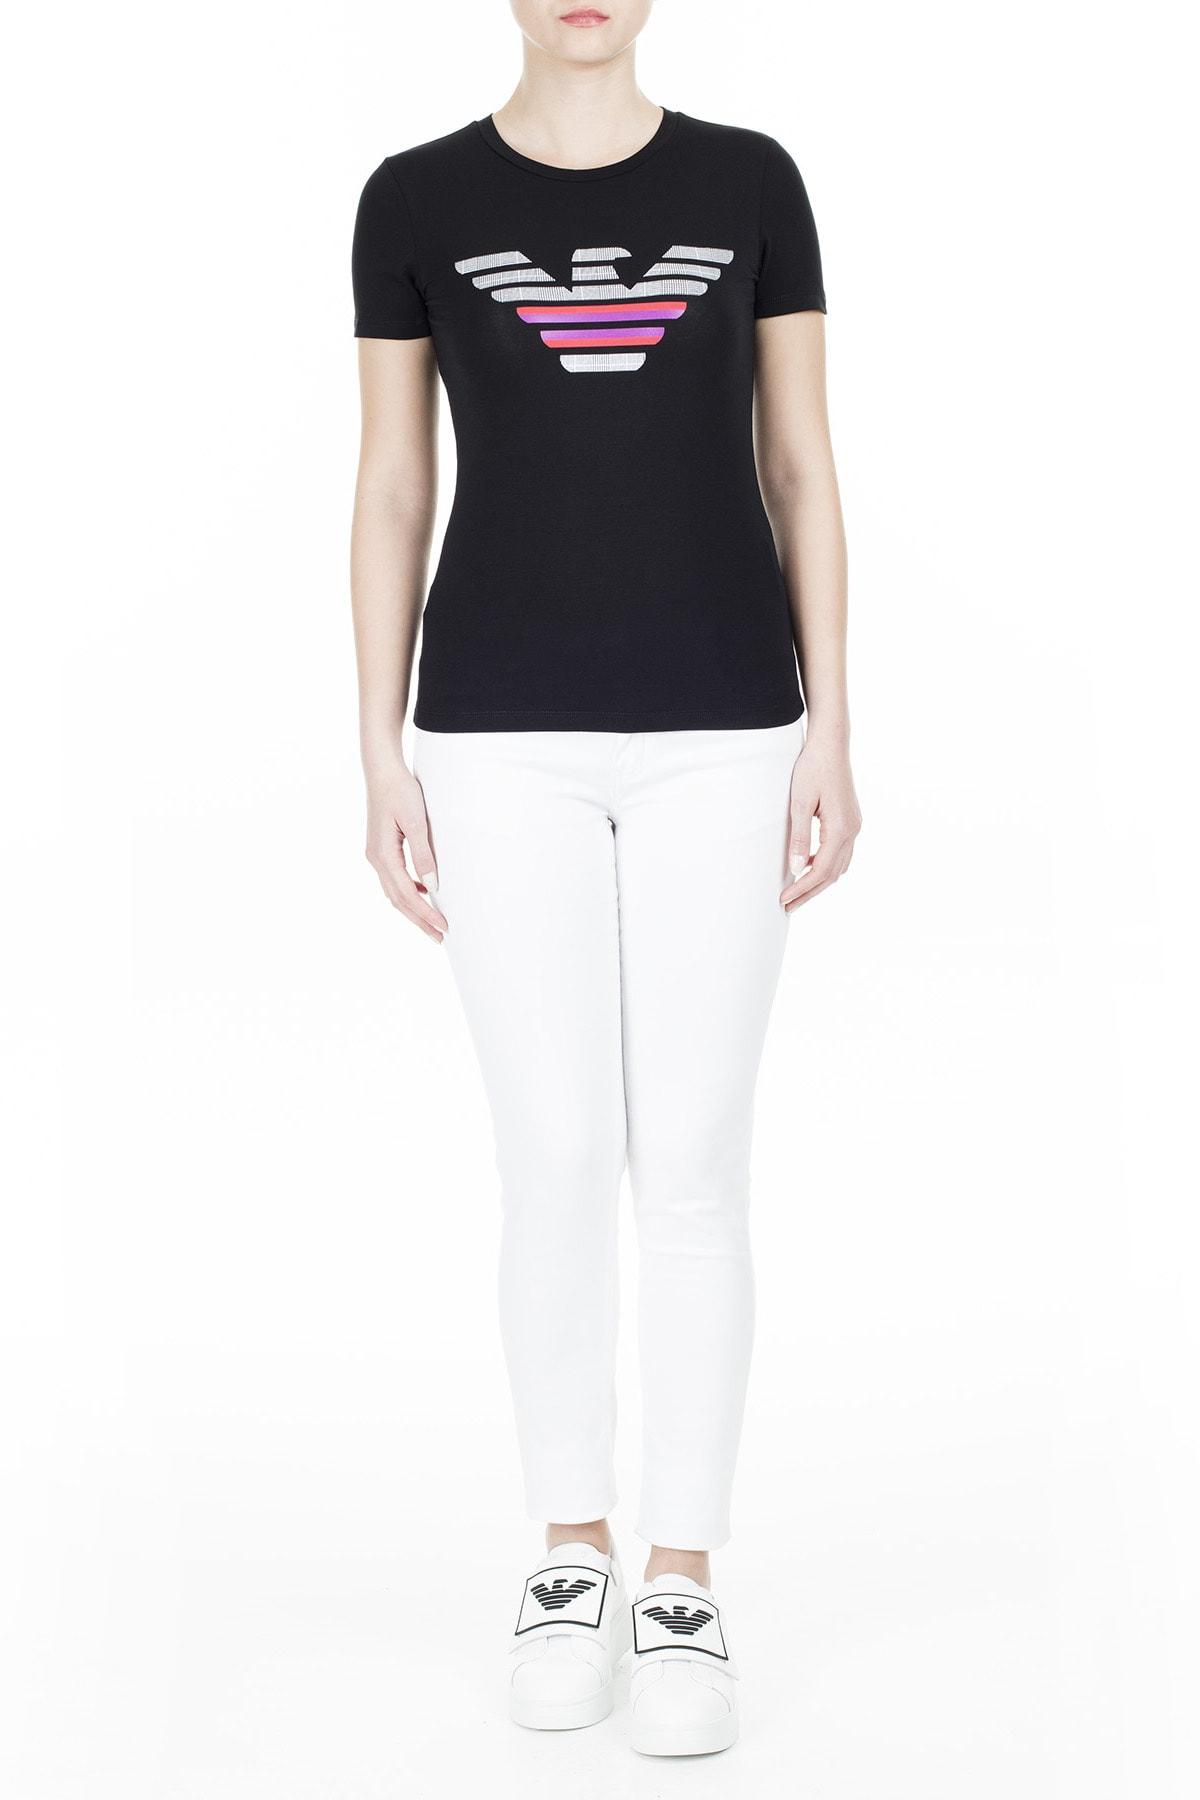 Emporio Armani Kadın Siyah T-Shirt 3H2T8A 2J07Z 0999 4